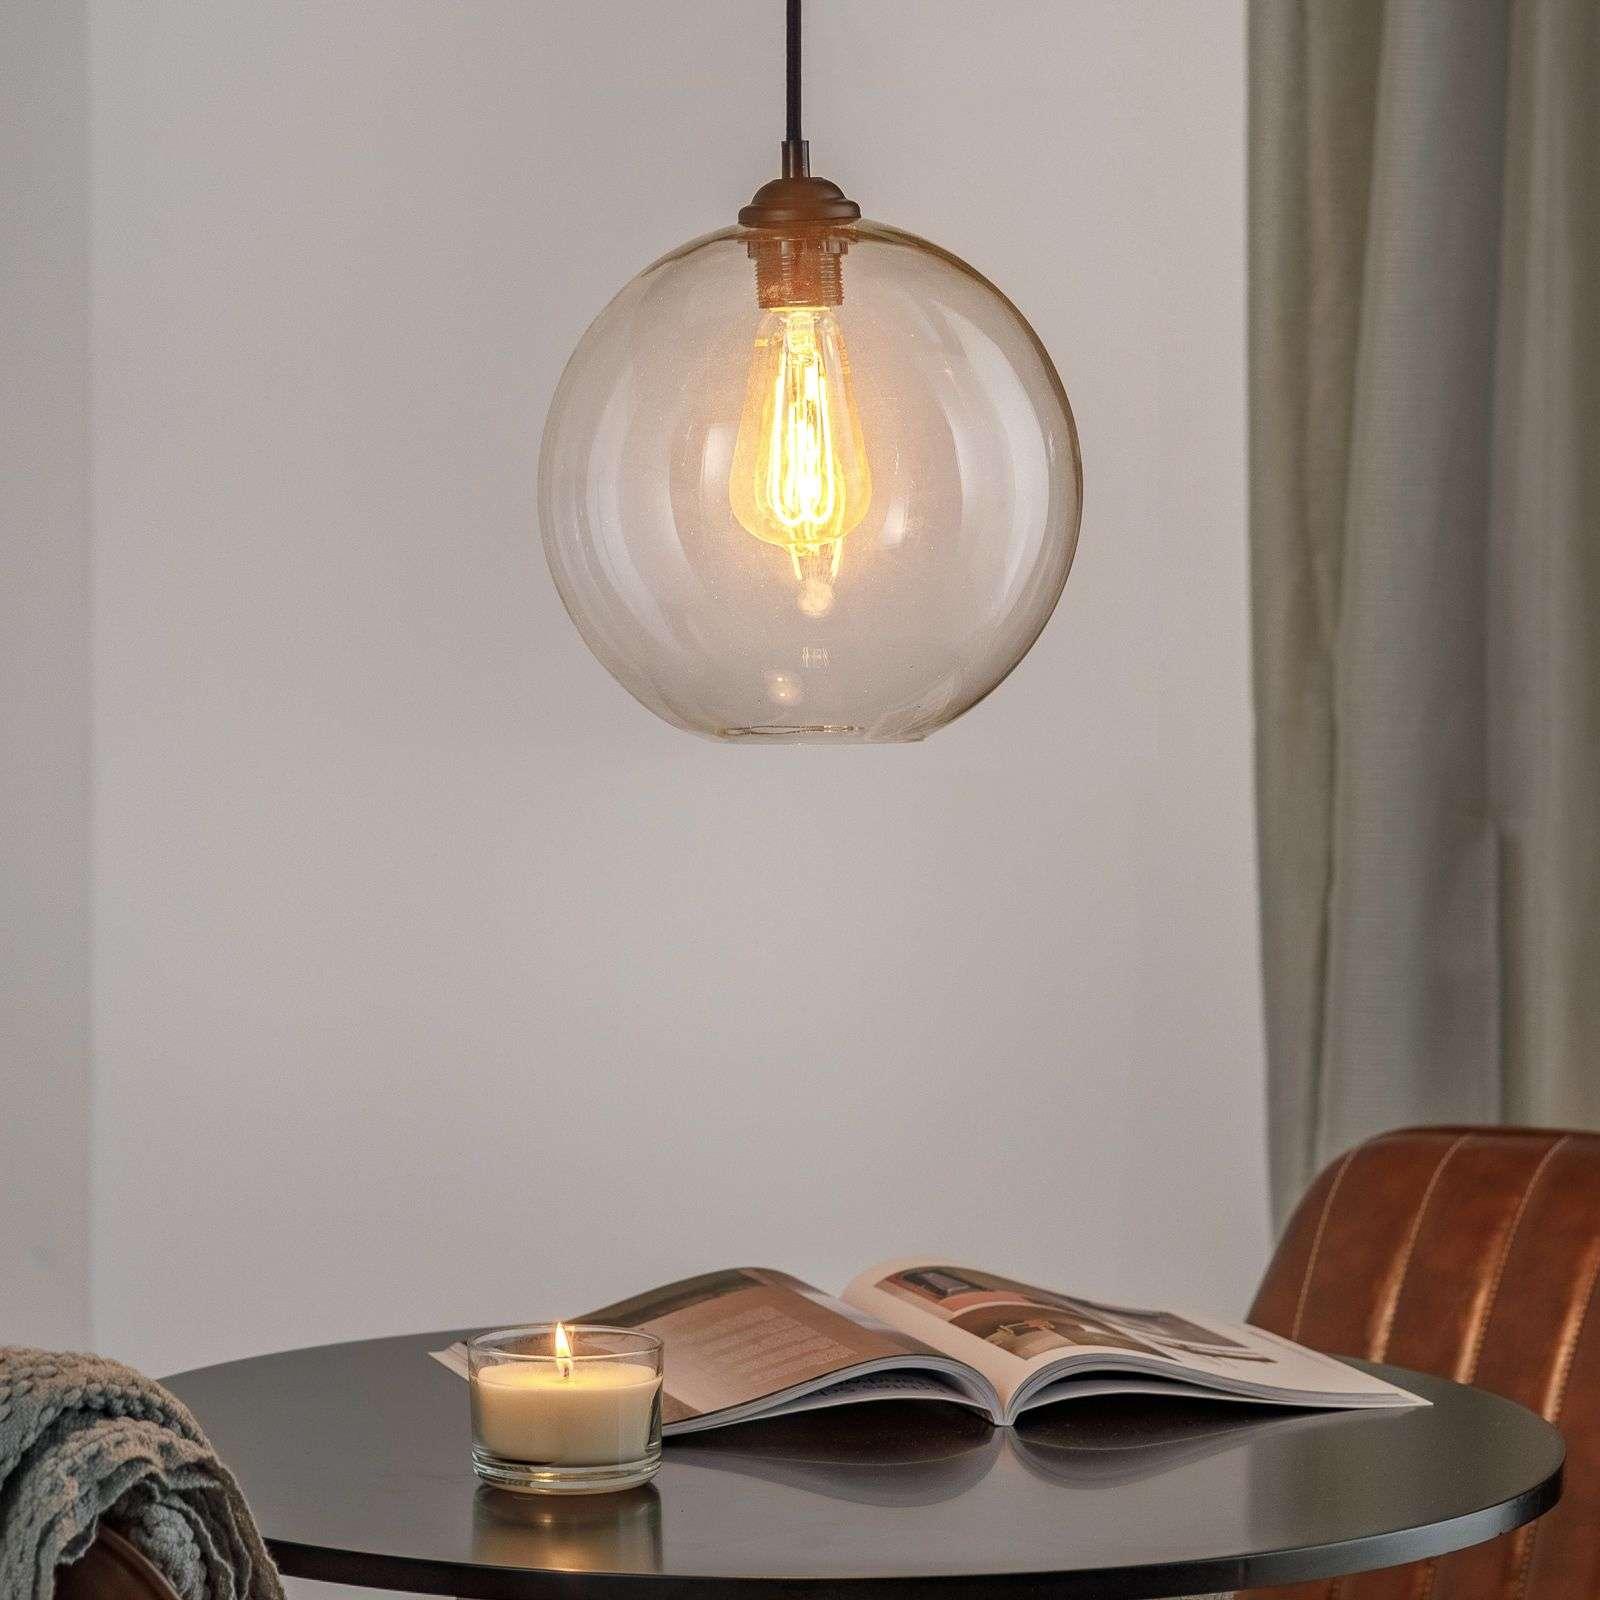 Spherical clara pendant light transparent lights spherical clara pendant light transparent 3507192 31 arubaitofo Images